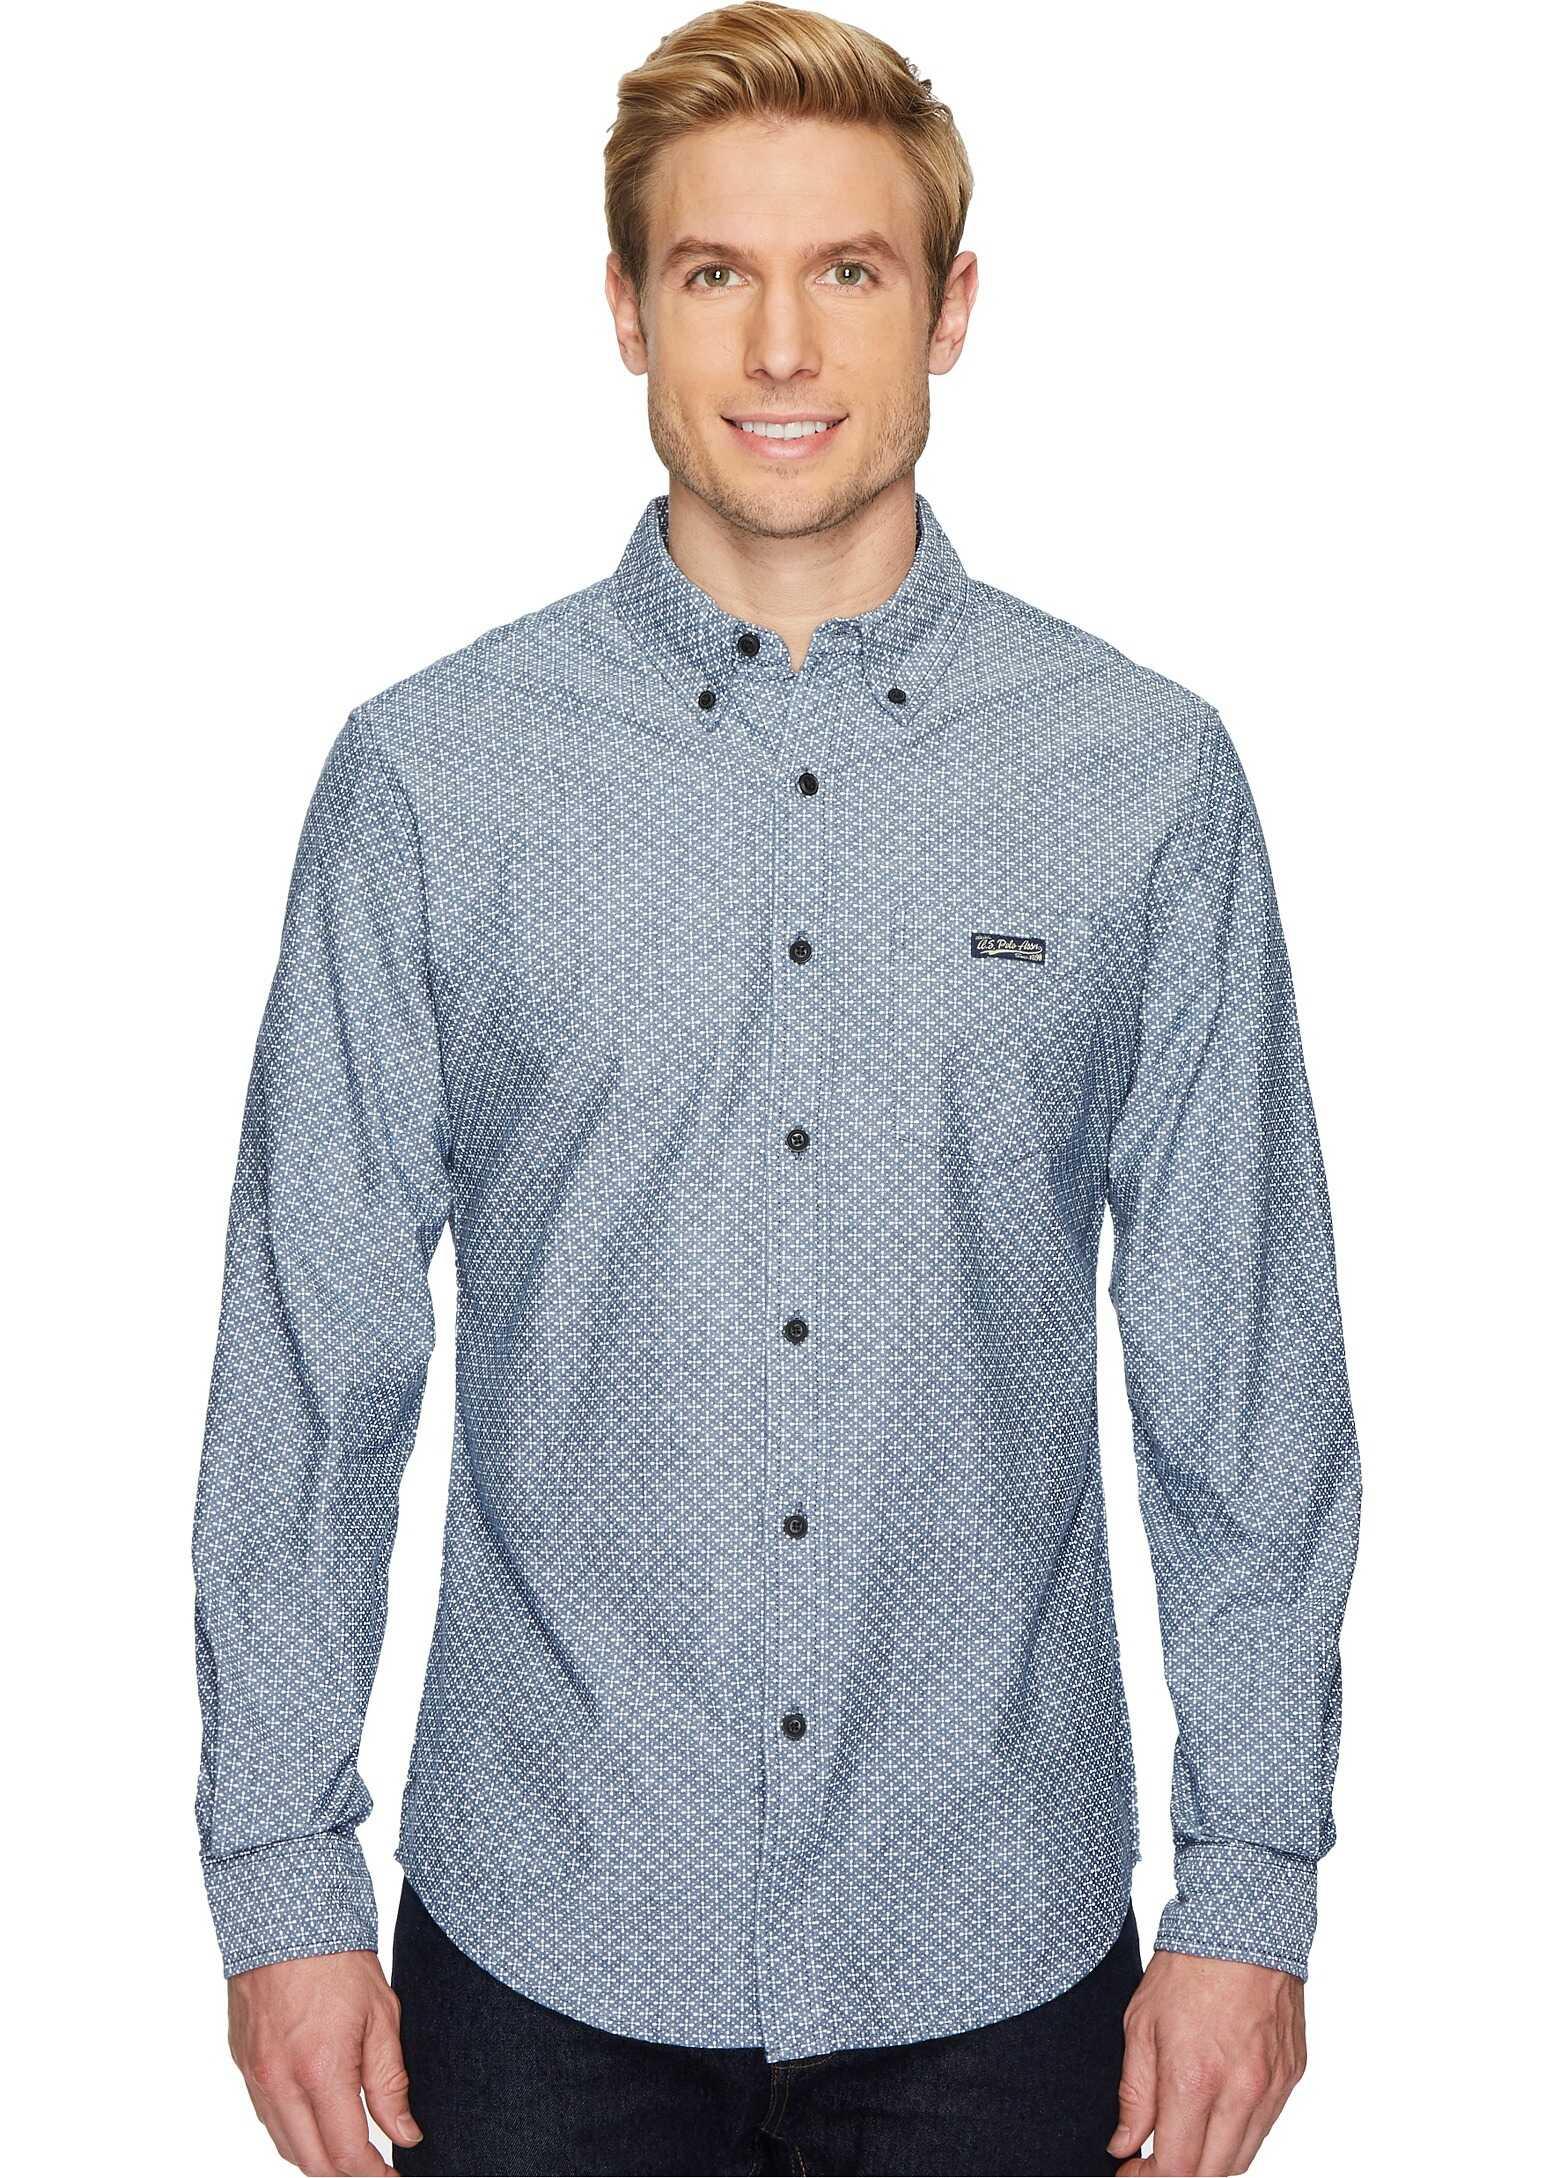 U.S. POLO ASSN. Long Sleeve Slim Fit Fancy Shirt Infinity Blue